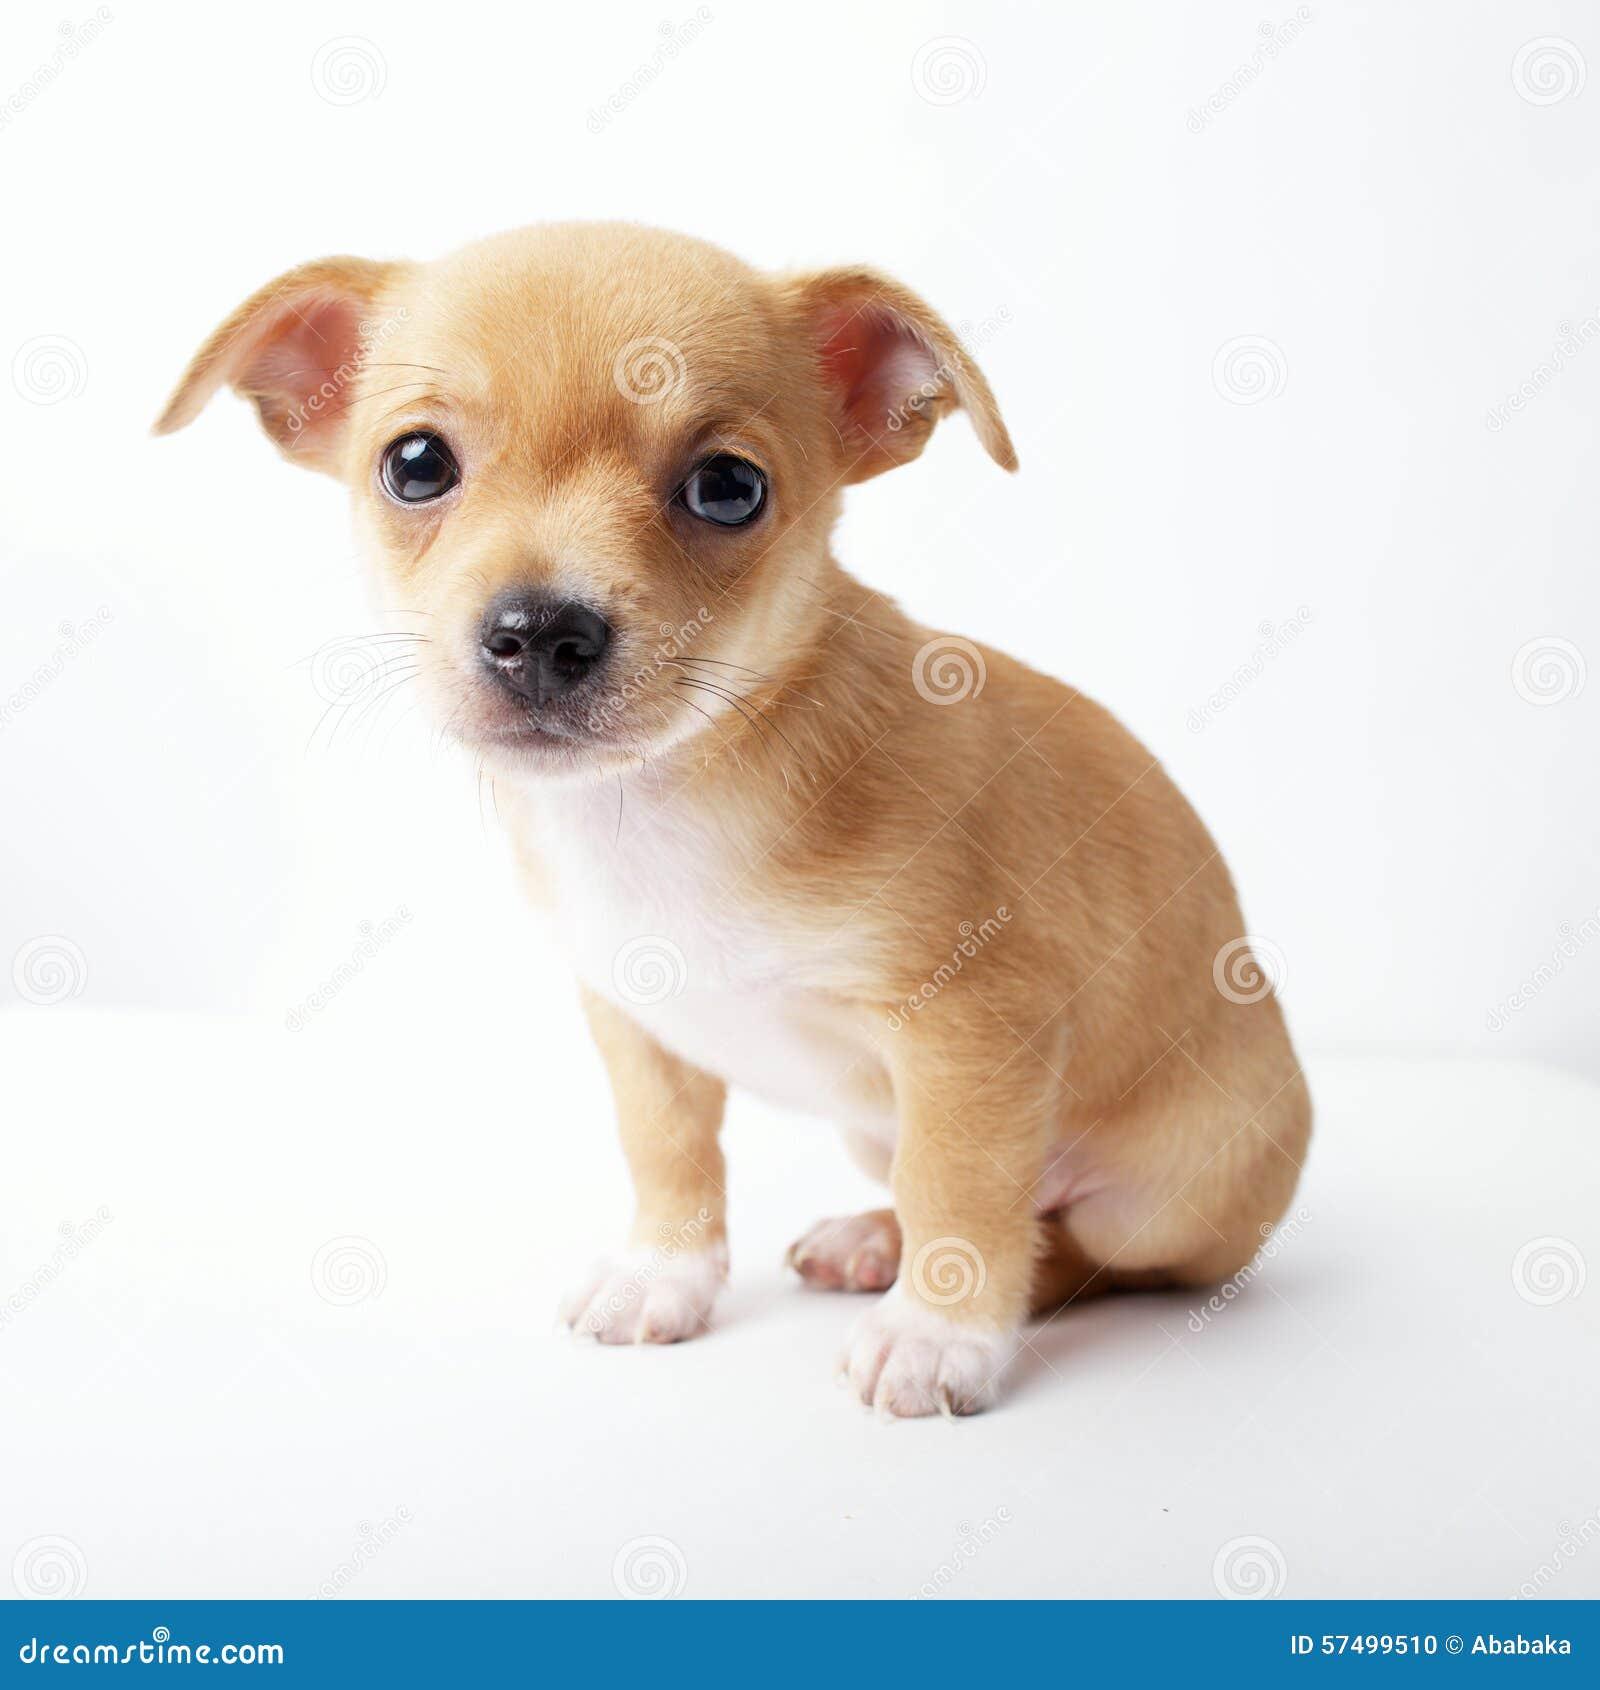 dog chihuahua background - photo #21